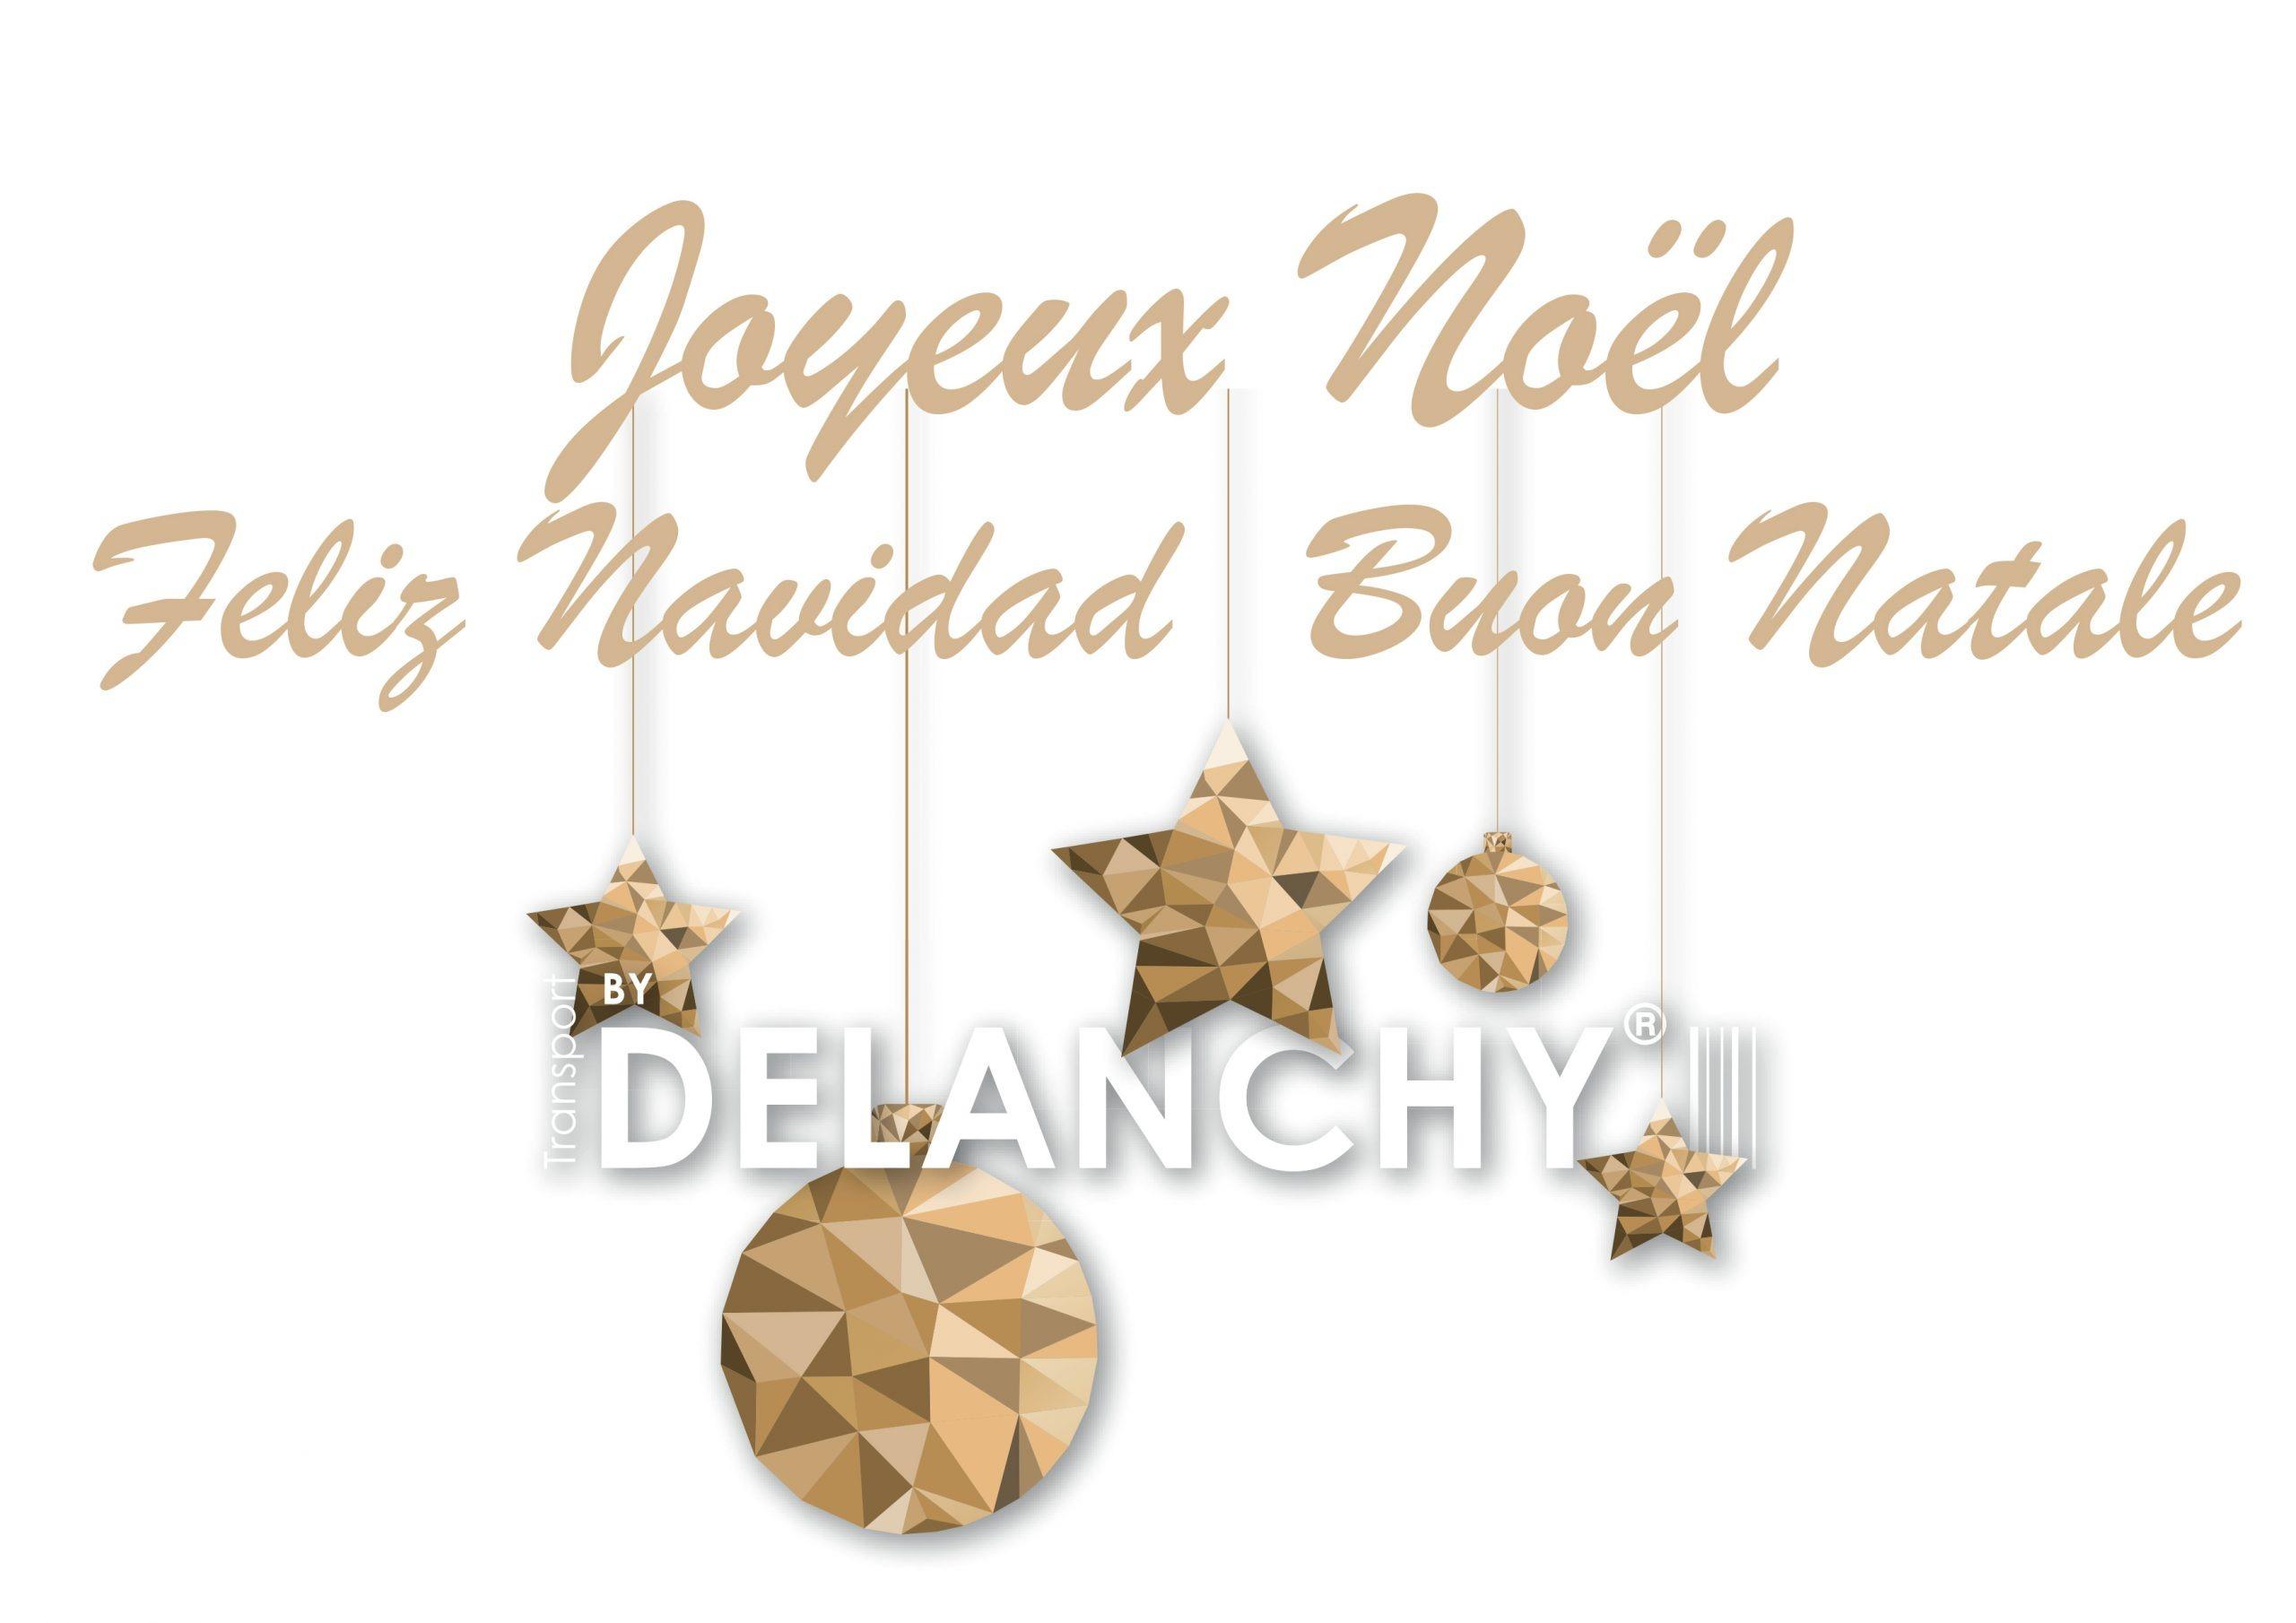 Joyeux Noel DELANCHY